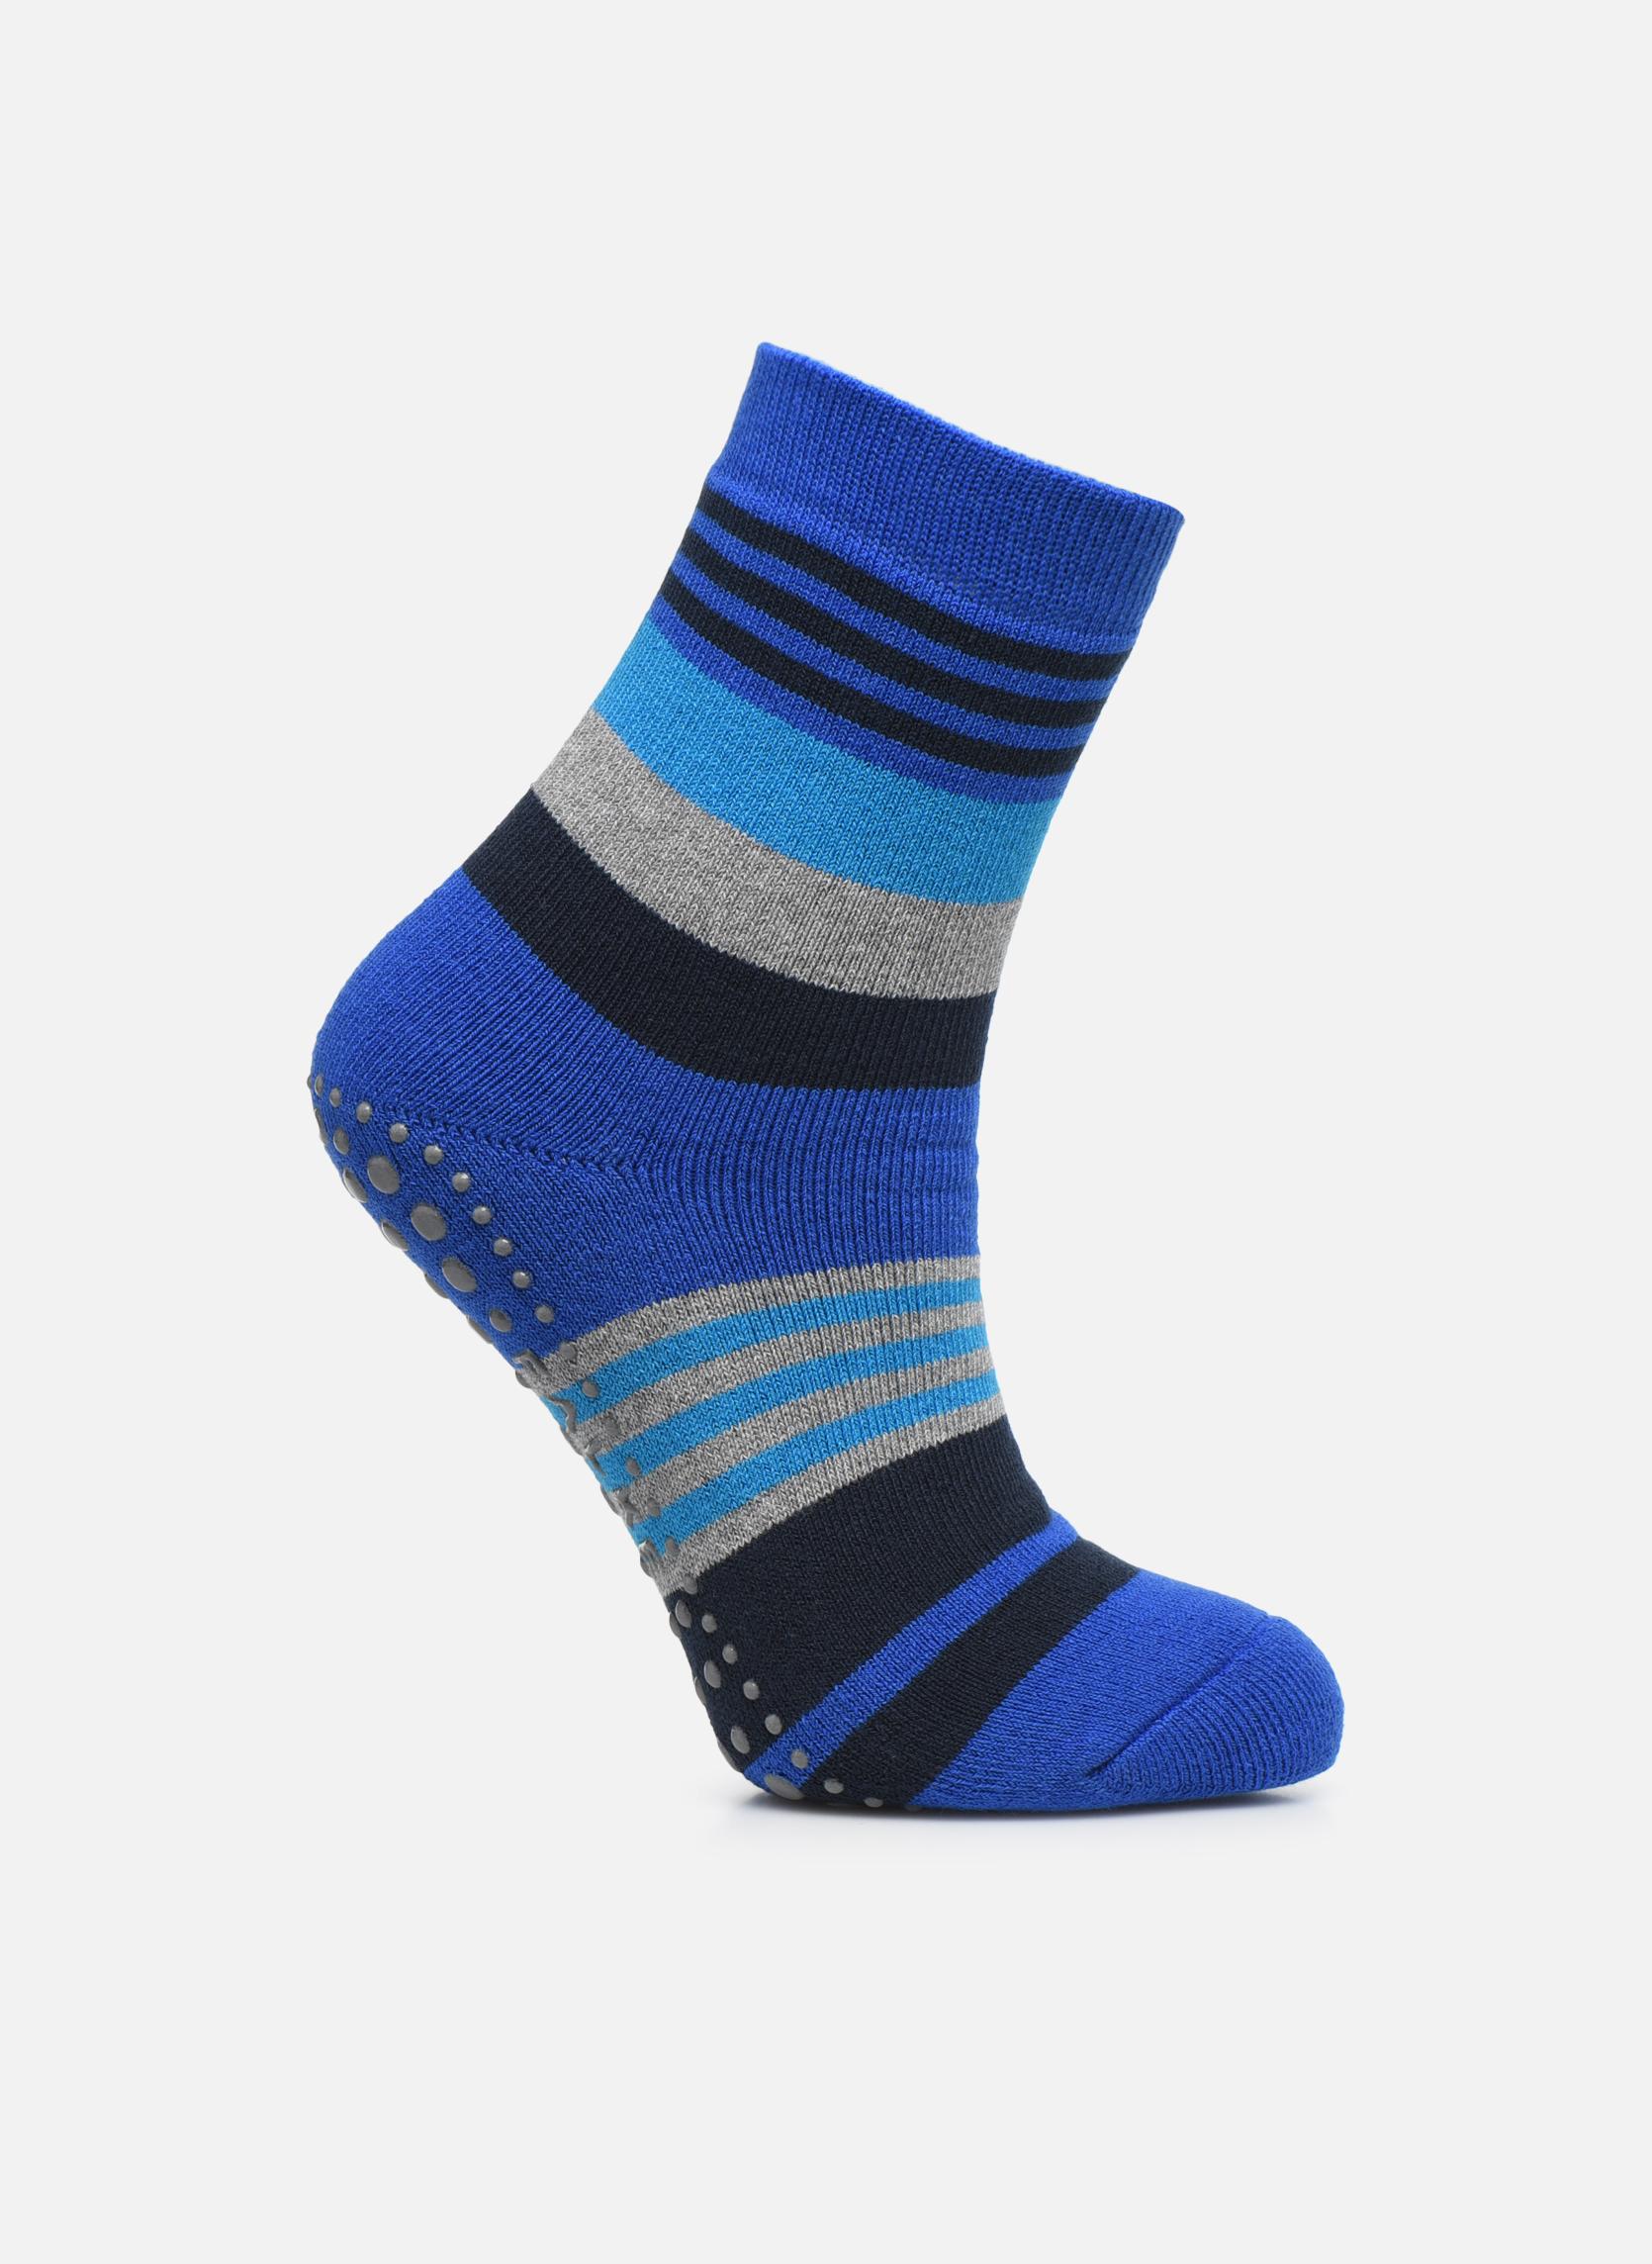 Chaussons-chaussettes Irregular Stripe Catspads 6054